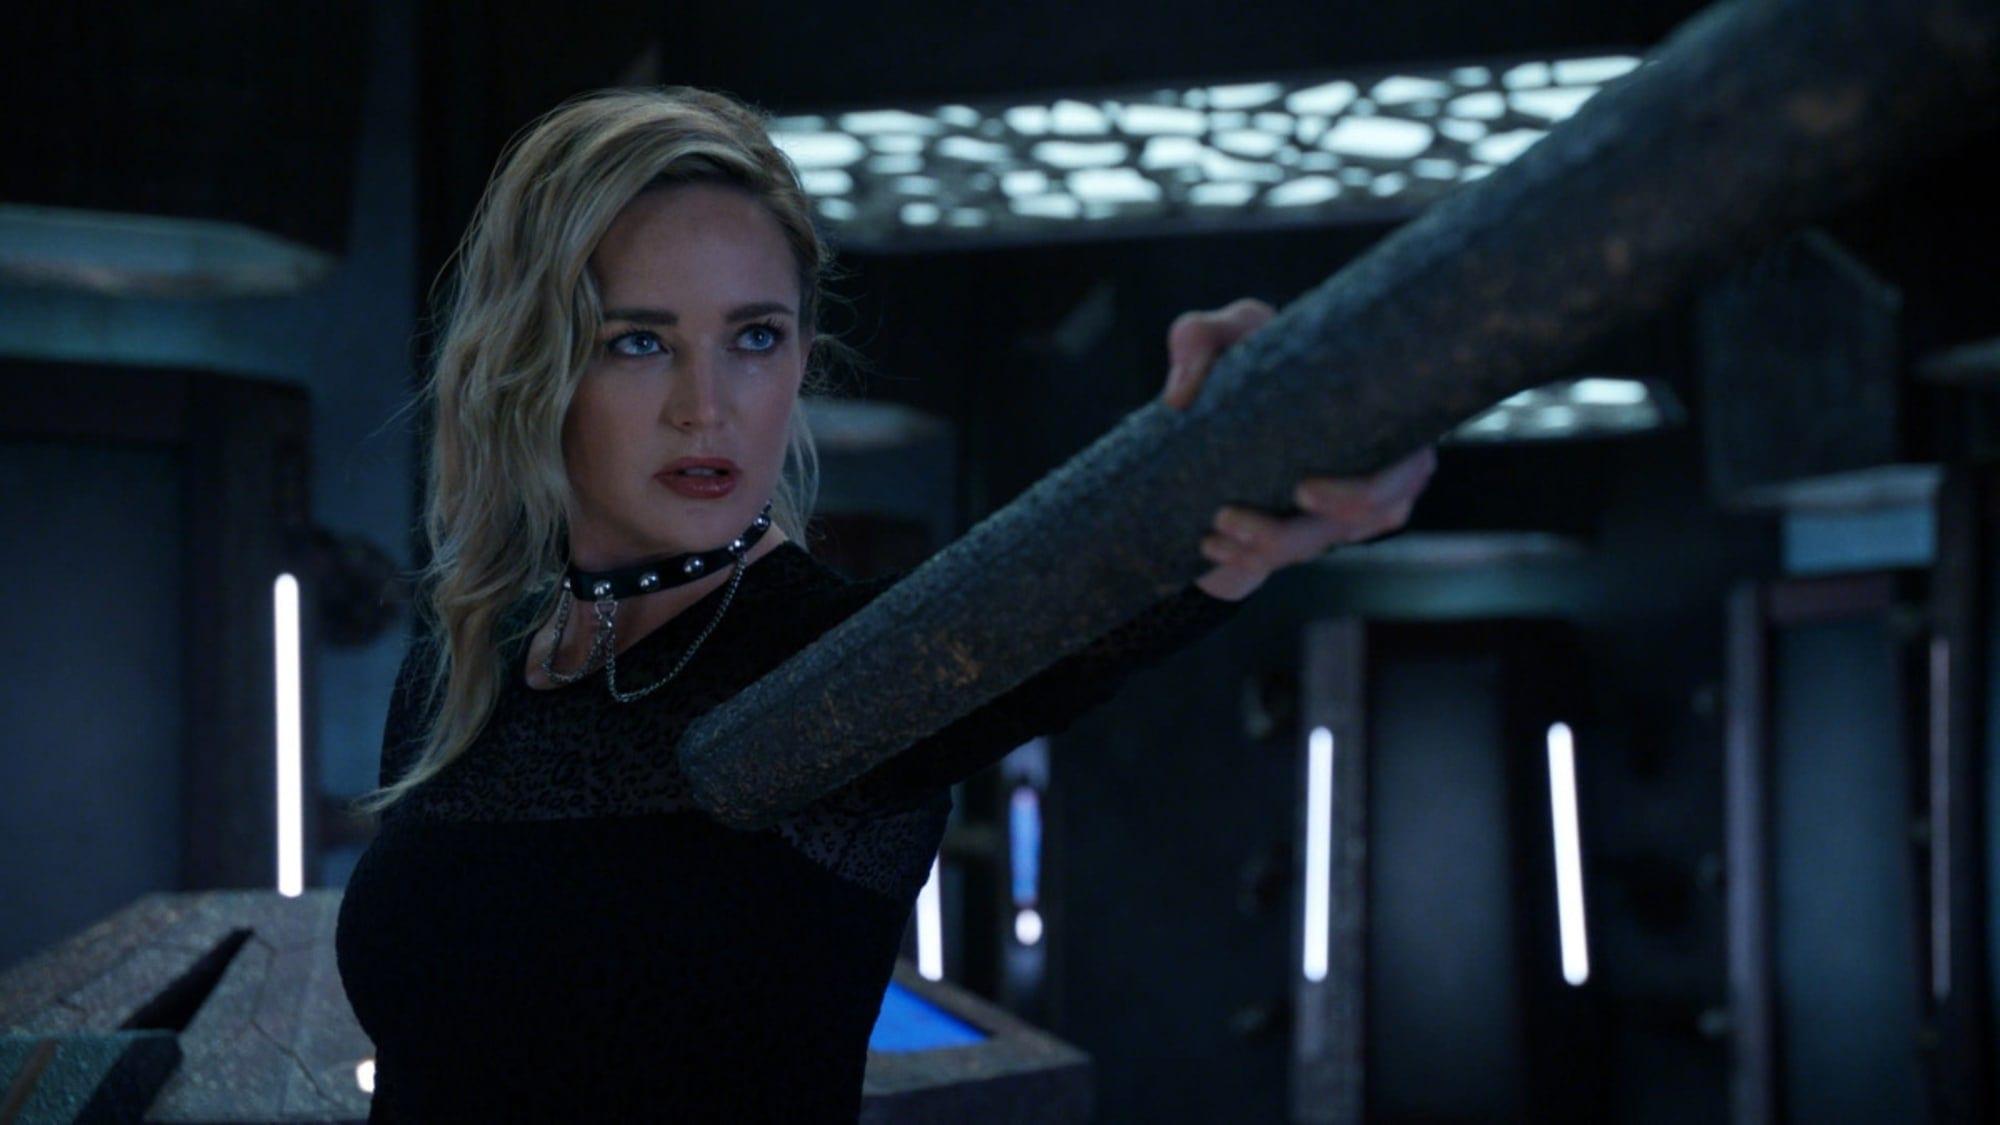 Preview And Recap: DC's Legends Of Tomorrow Season 6 Episode 7